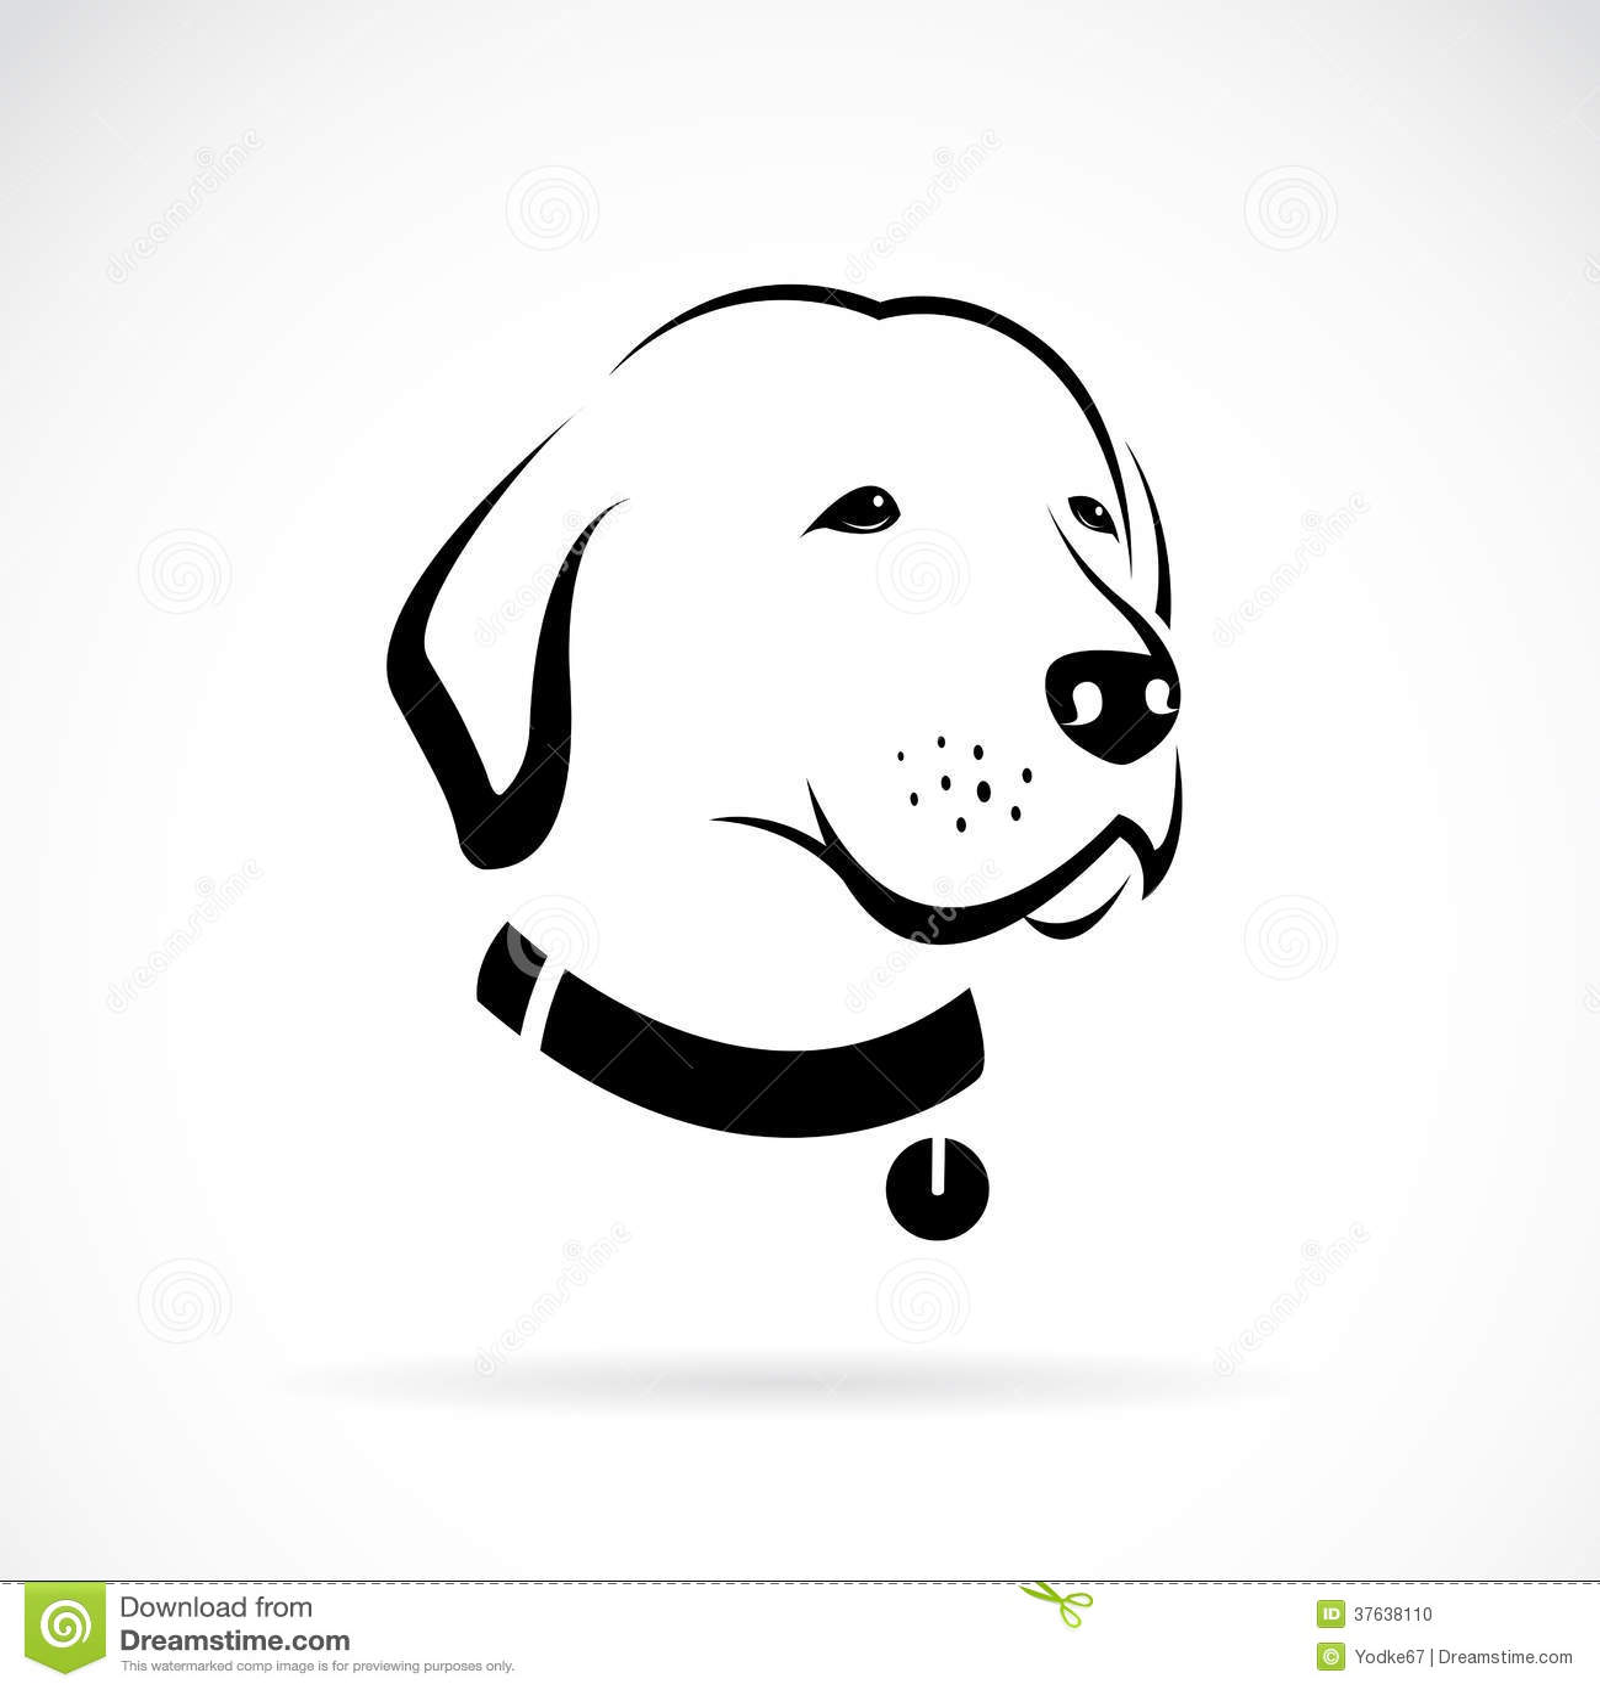 Vector Image Of An Labrador Dog's Head Stock Photo - Image: 37638110